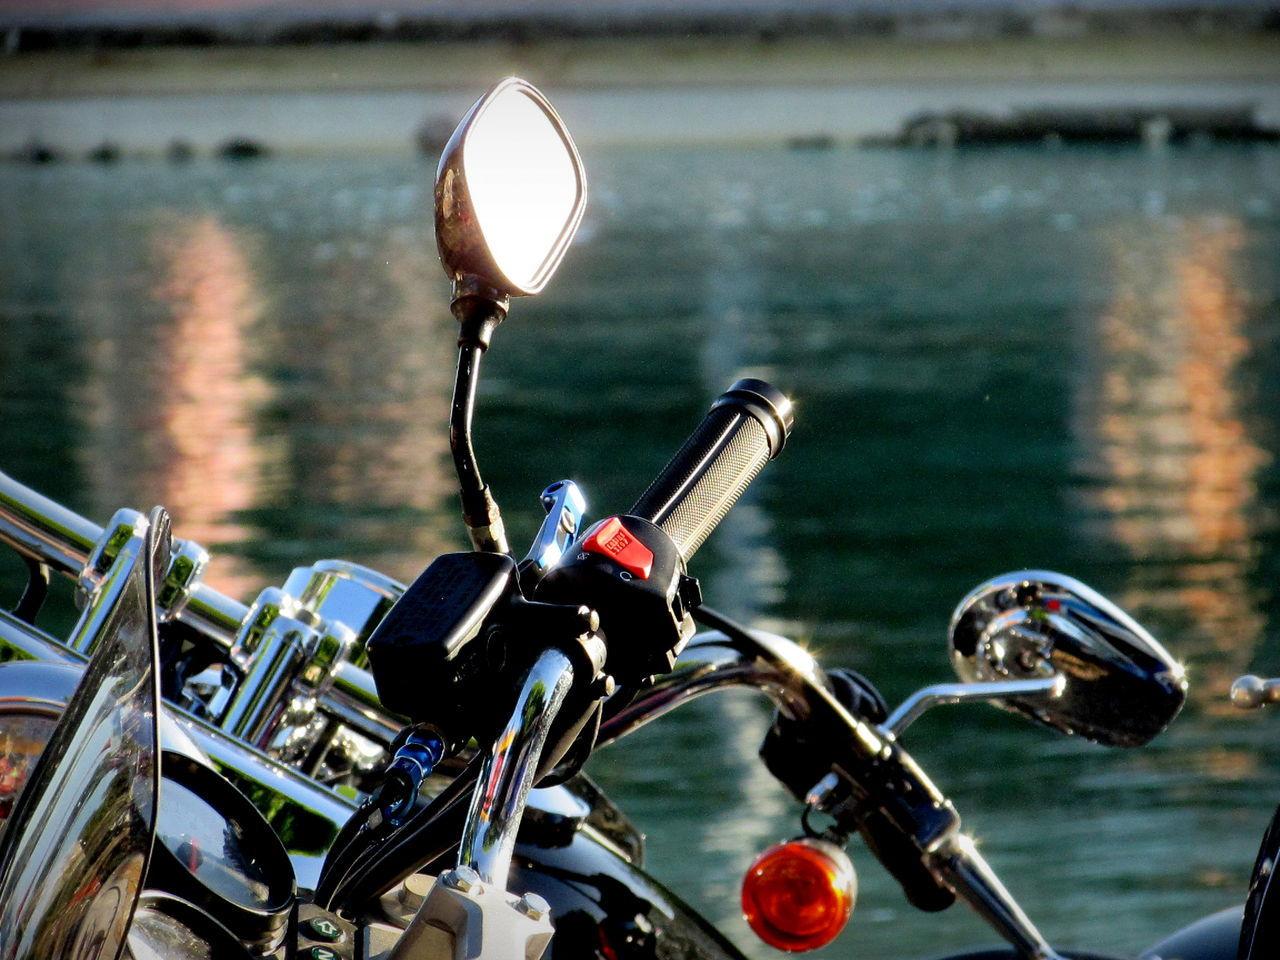 Mirror On Motorcycle Handlebar Against River